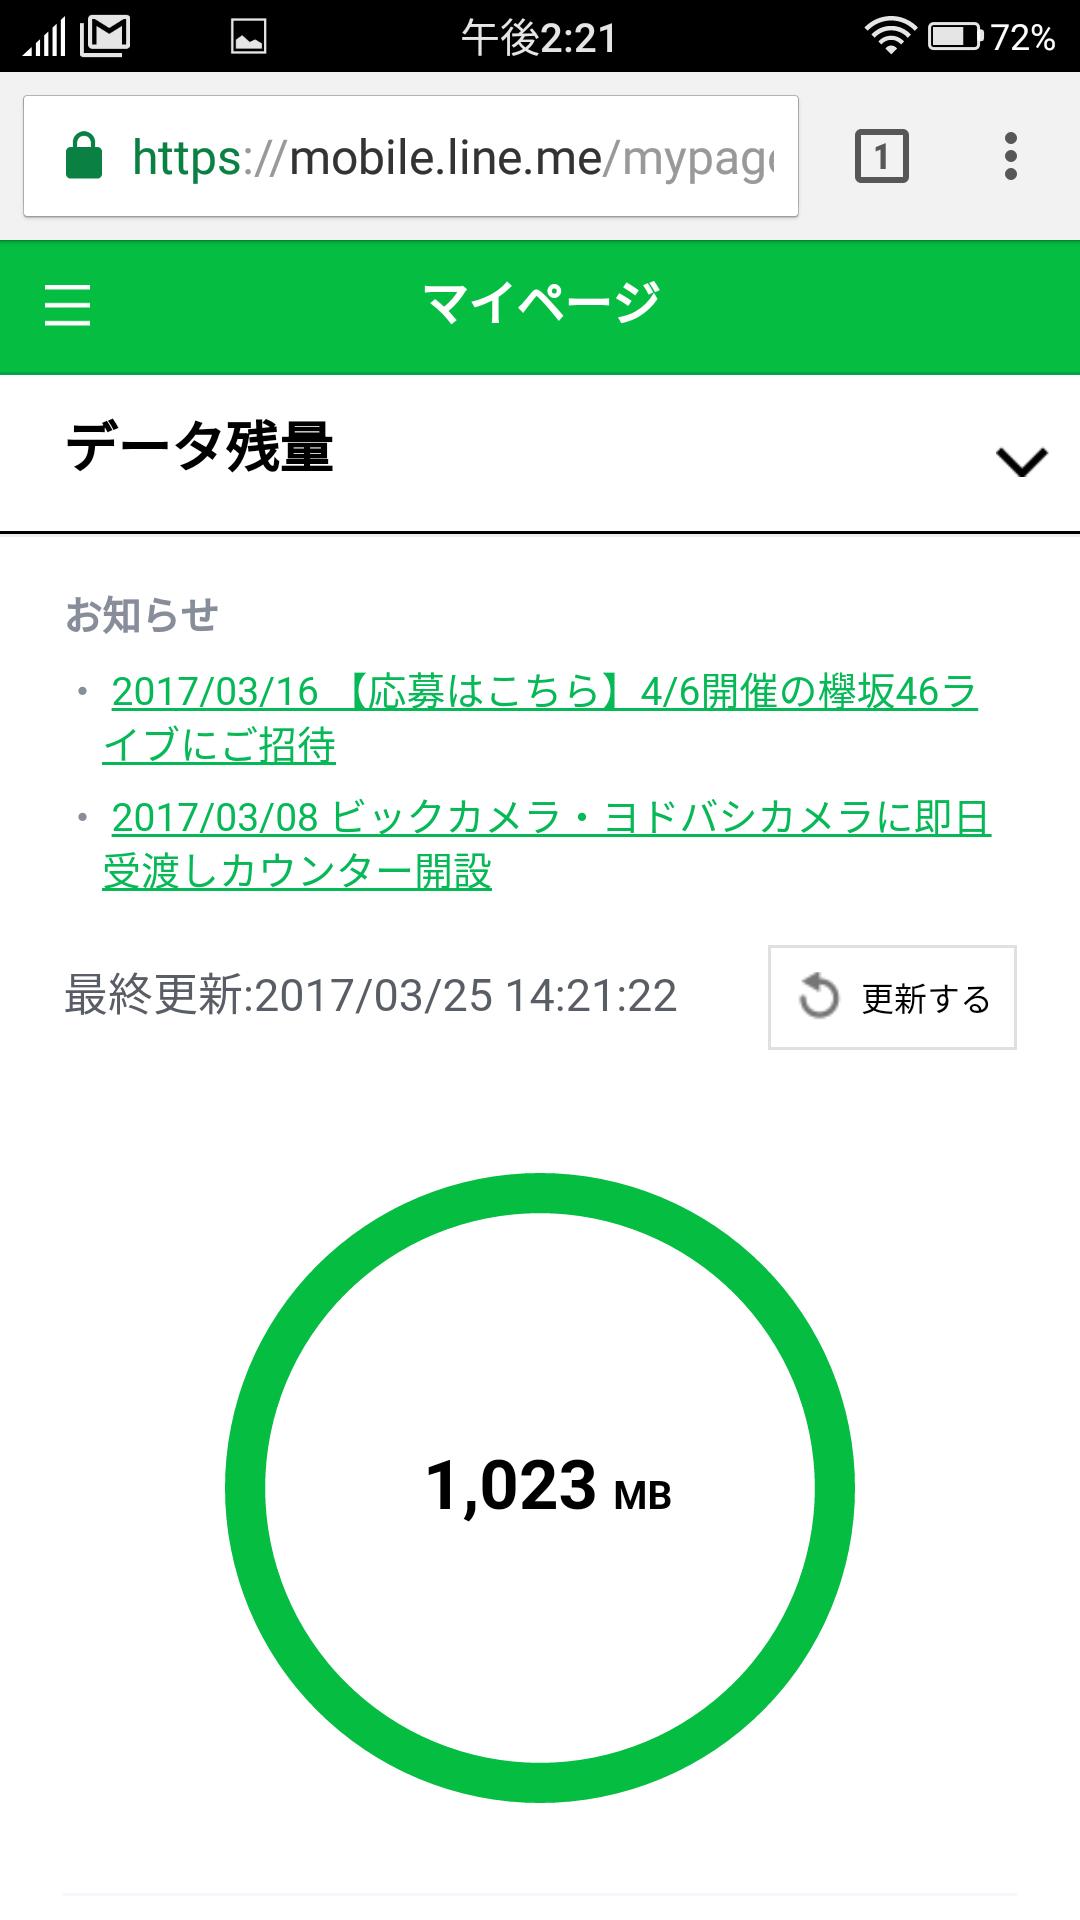 LINEモバイルの契約者連携マイページ